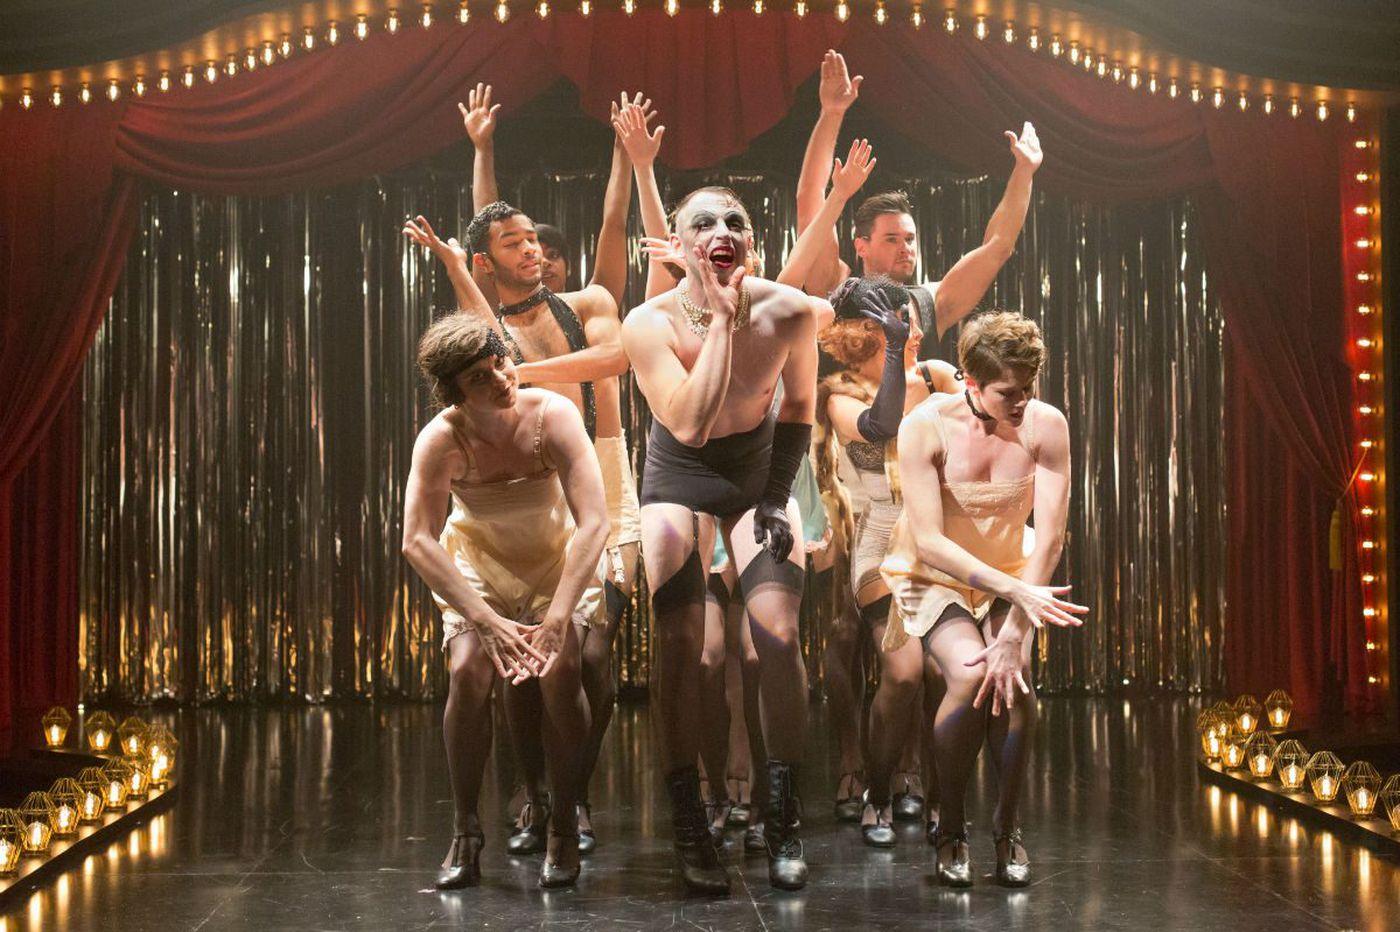 Douglas Carter Beane Talks About Burlesque, Gay History, And Cinderella